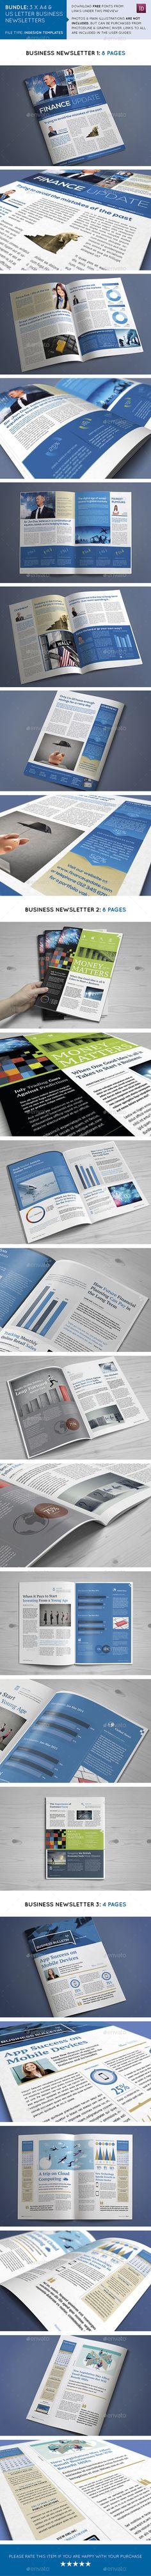 Business Newsletters Bundle Template #design Download: http://graphicriver.net/item/business-newsletters-bundle/11116581?ref=ksioks